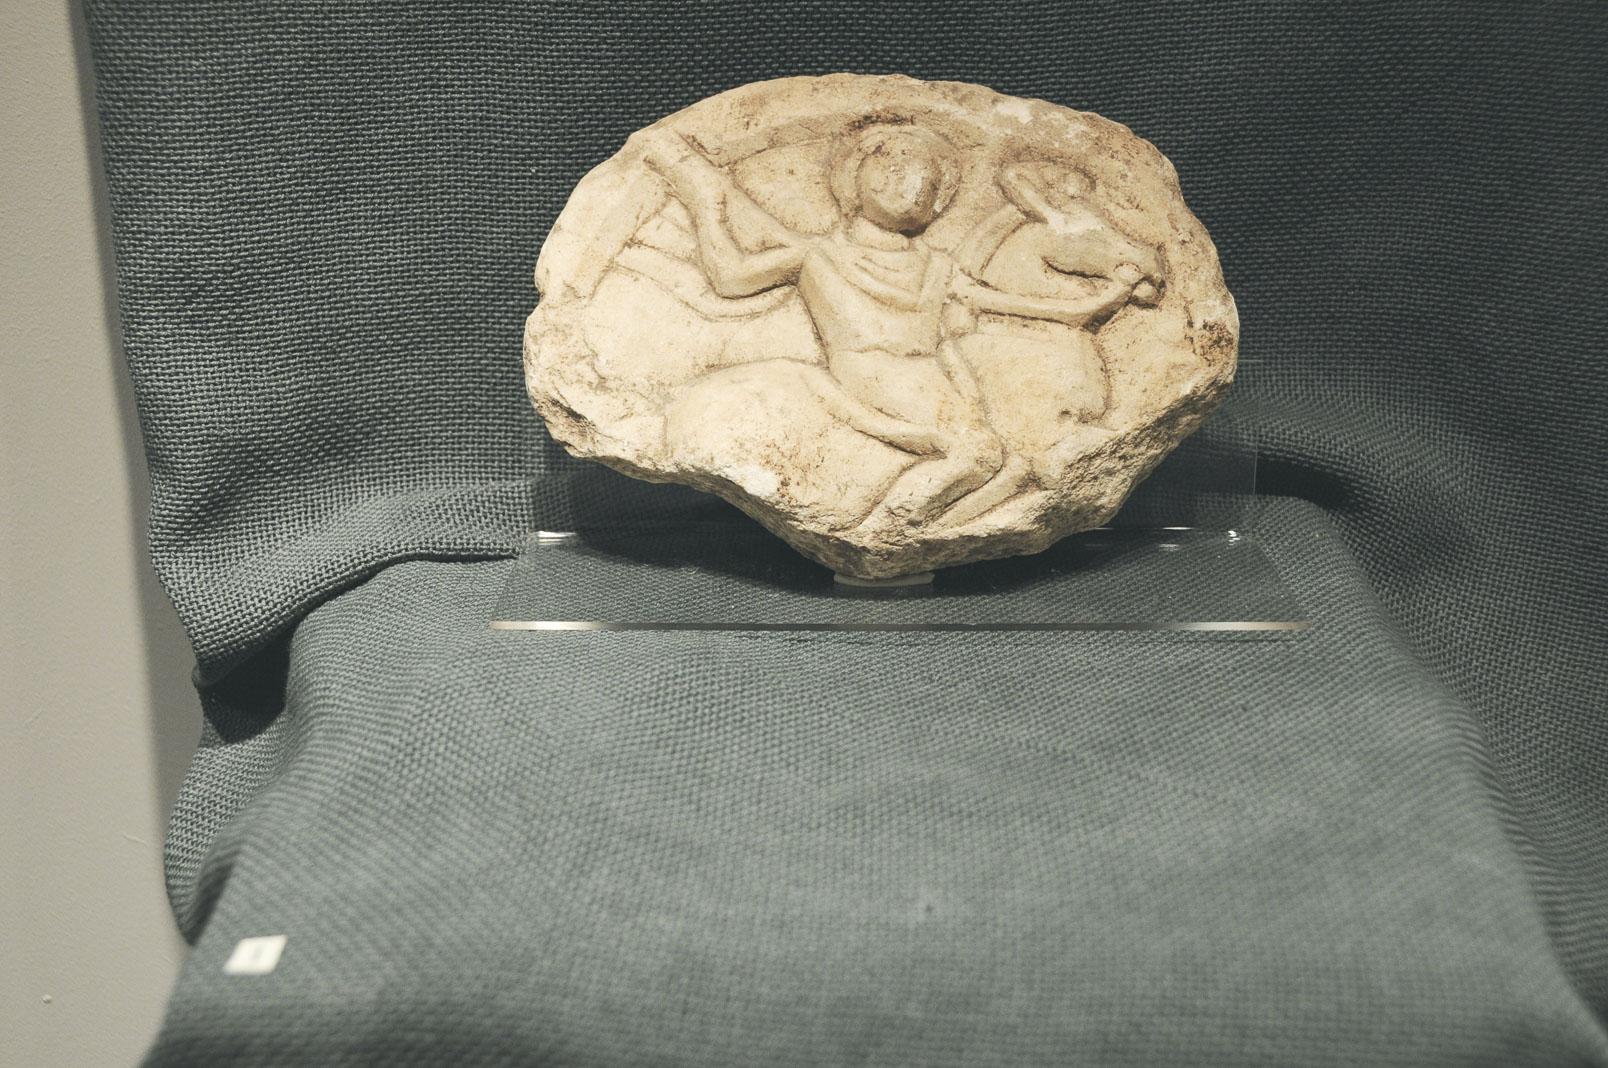 troyan-museum-jivotat-na-edna-idea-2